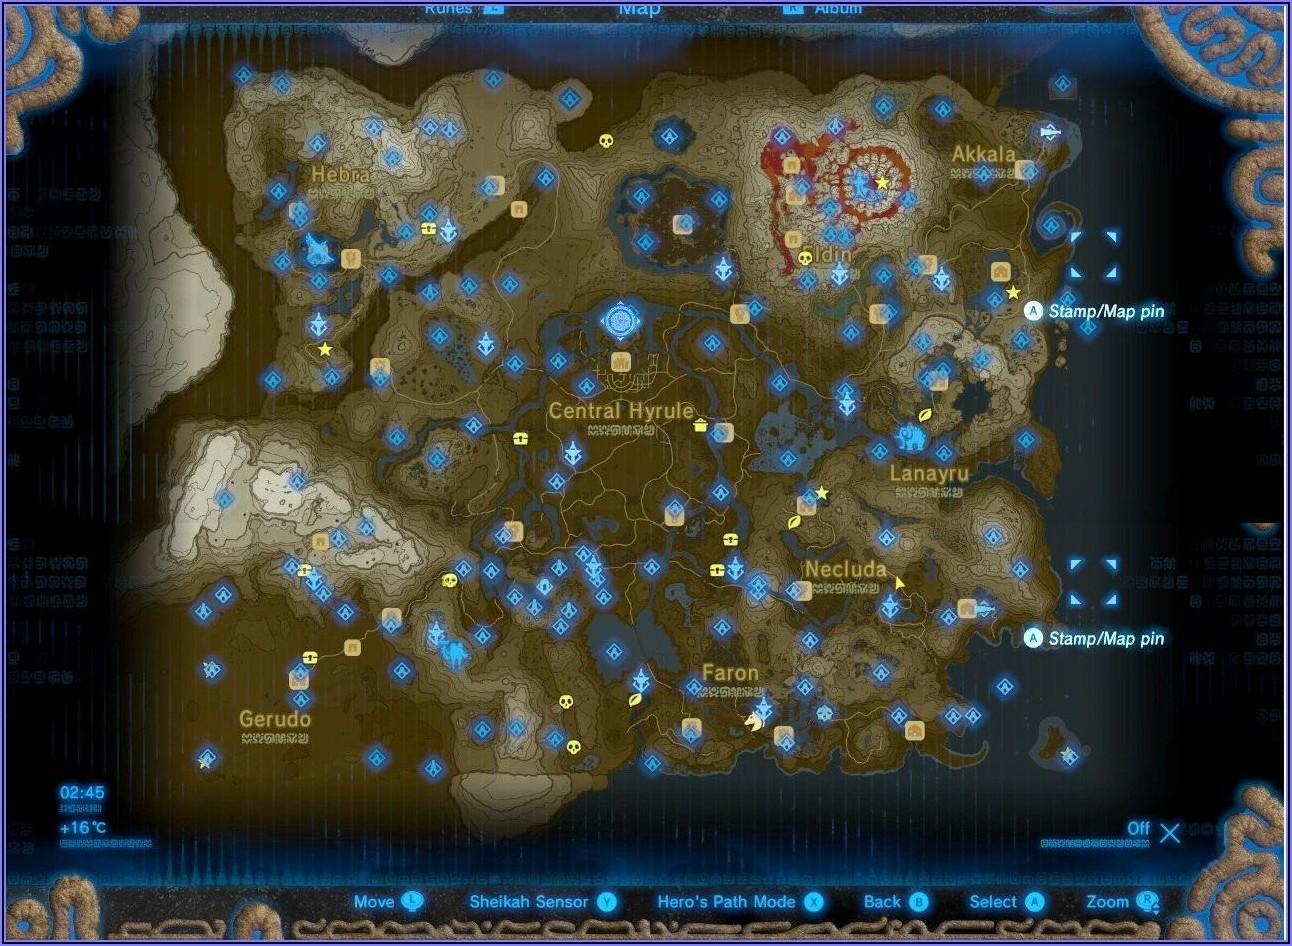 Botw Shrines Locations Map